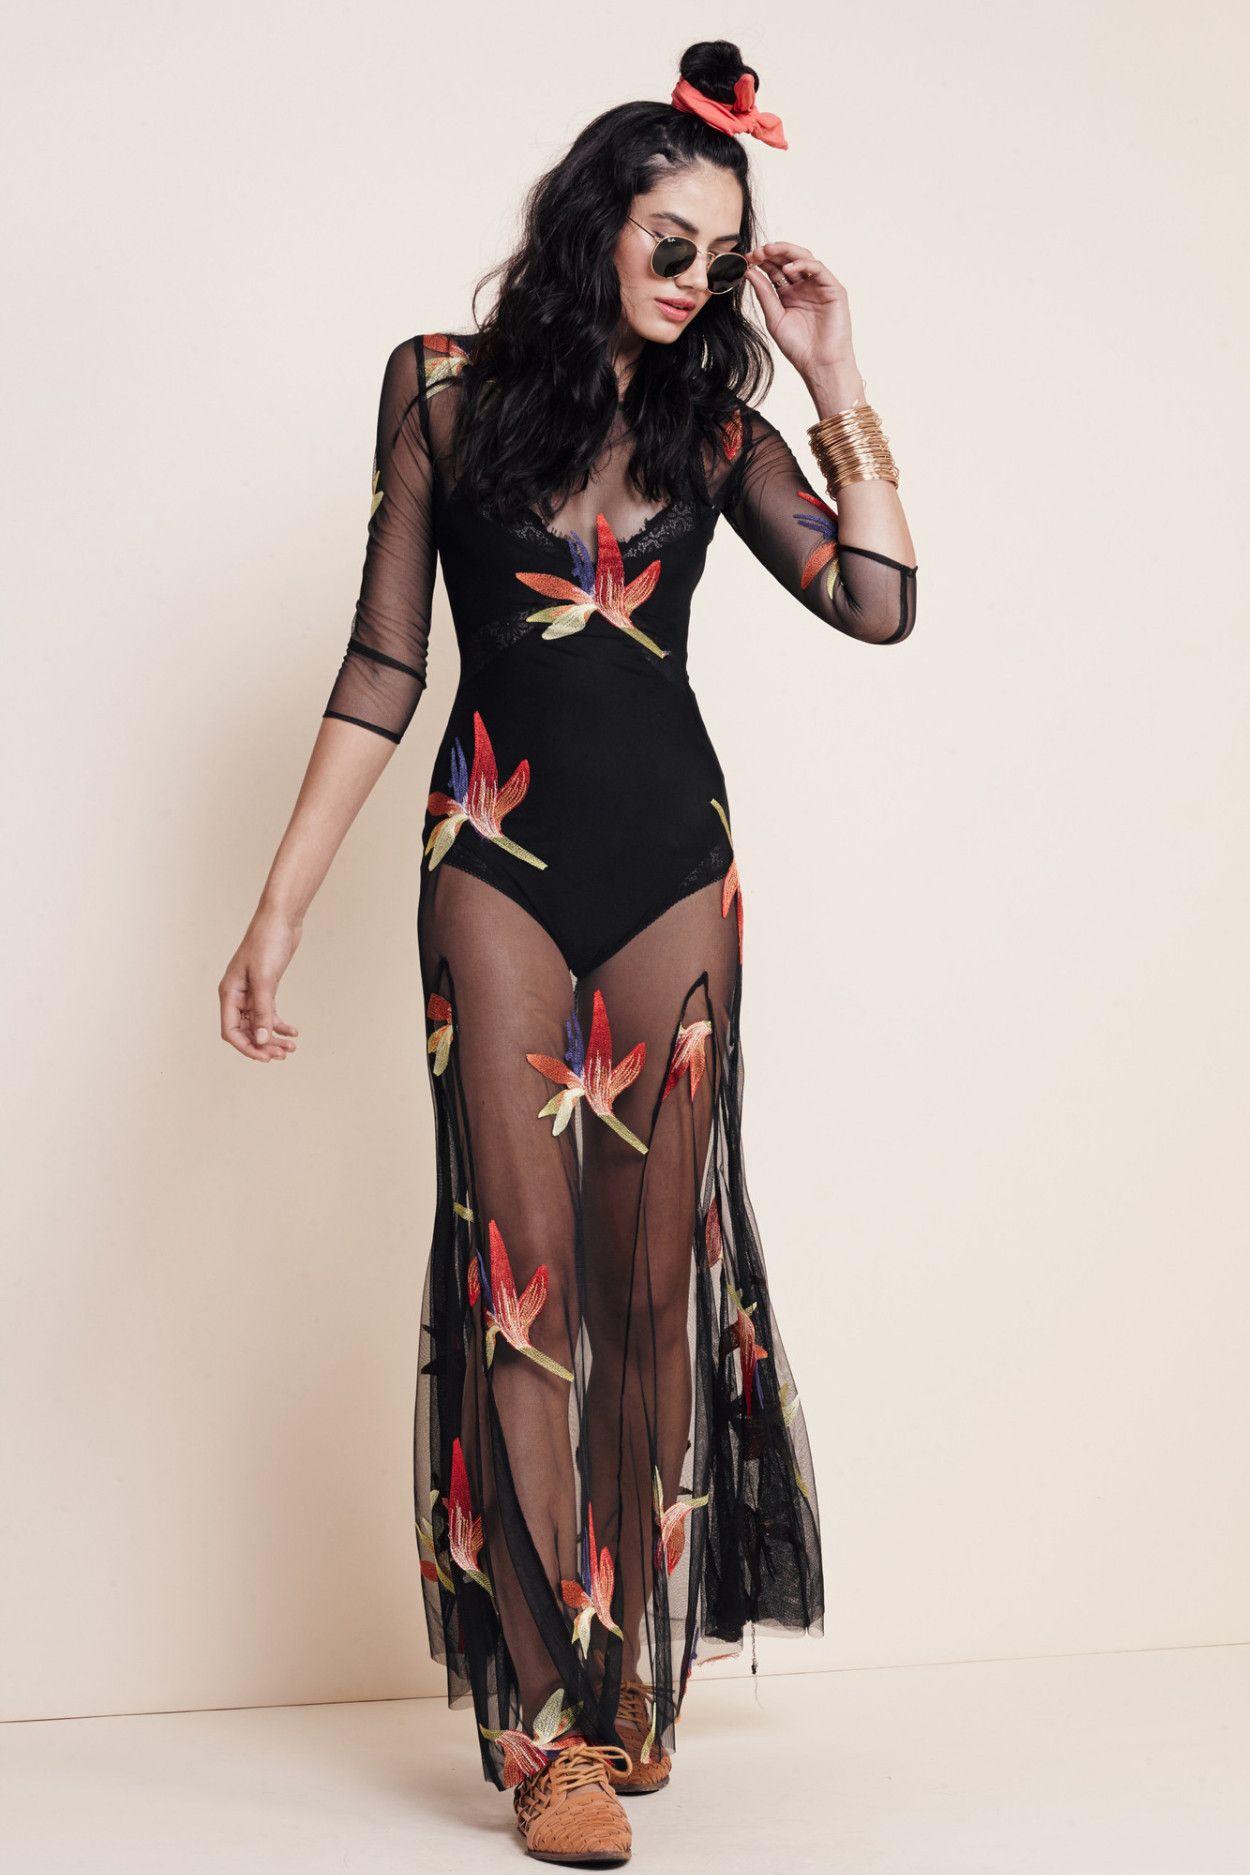 a0b9b86430 BIRDS OF PARADISE MAXI DRESS Sheer Overlay Dress